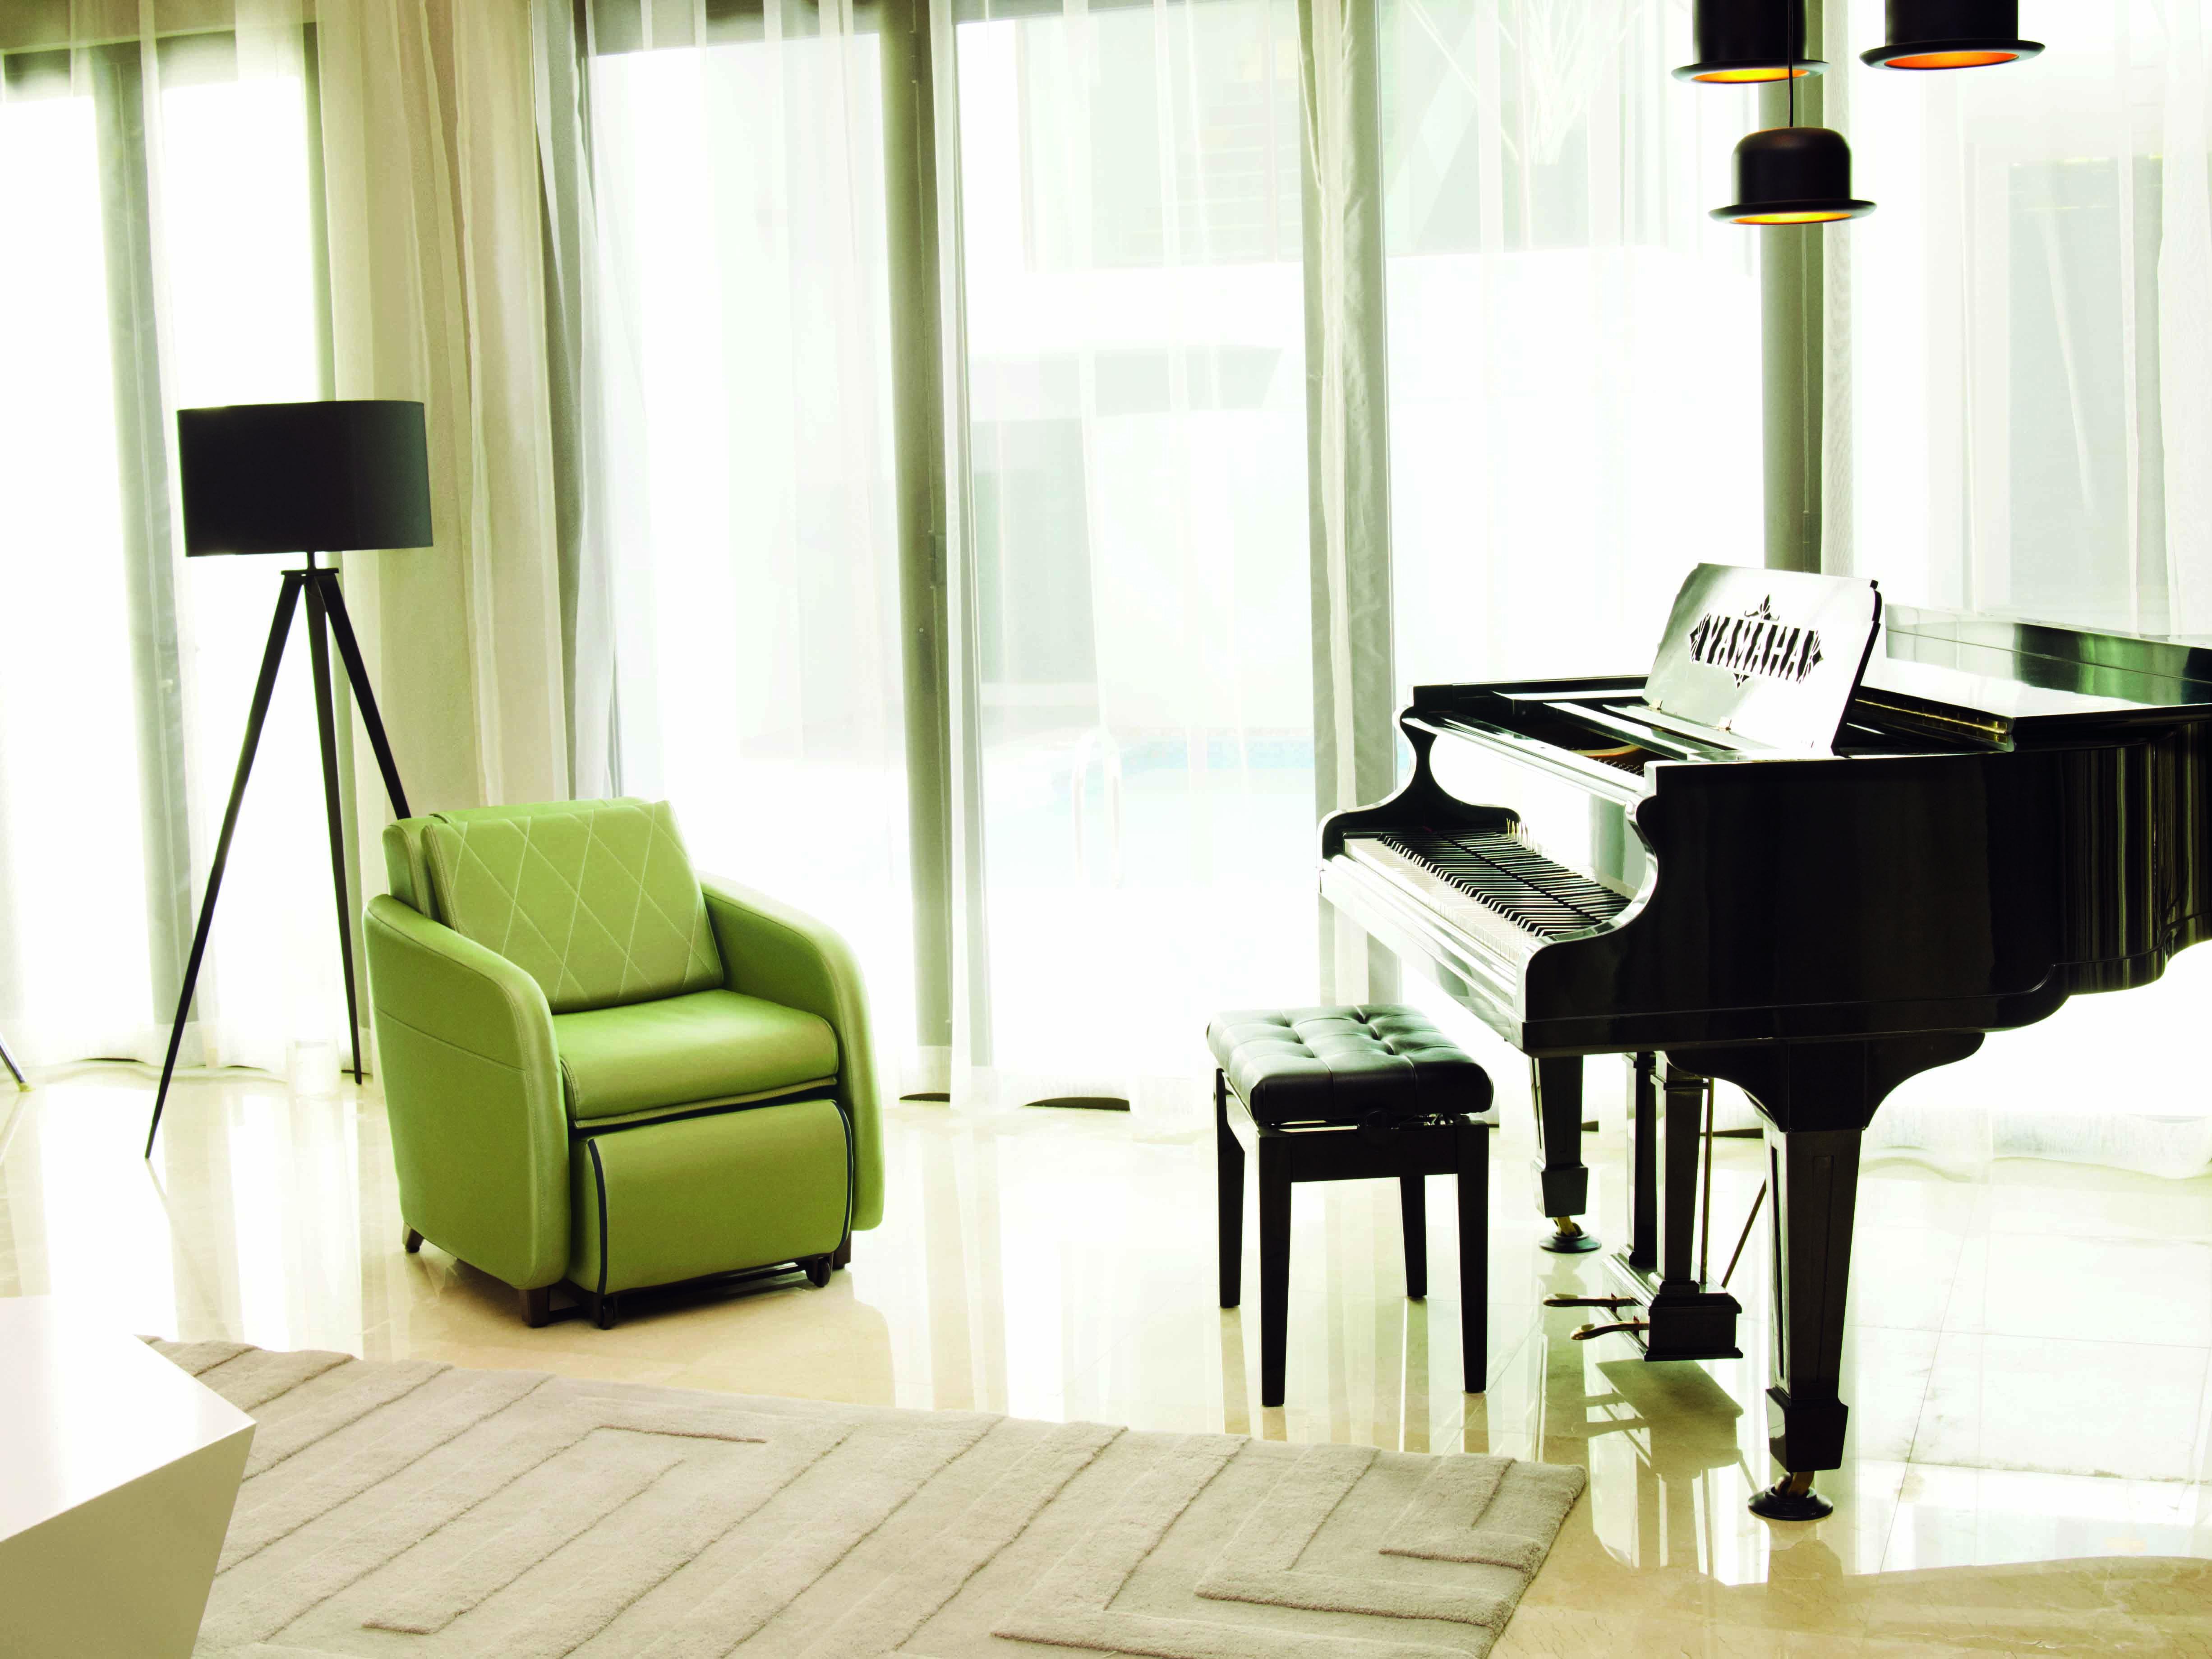 OSIM uAngel massage Sofa Chair green Sofa transform to